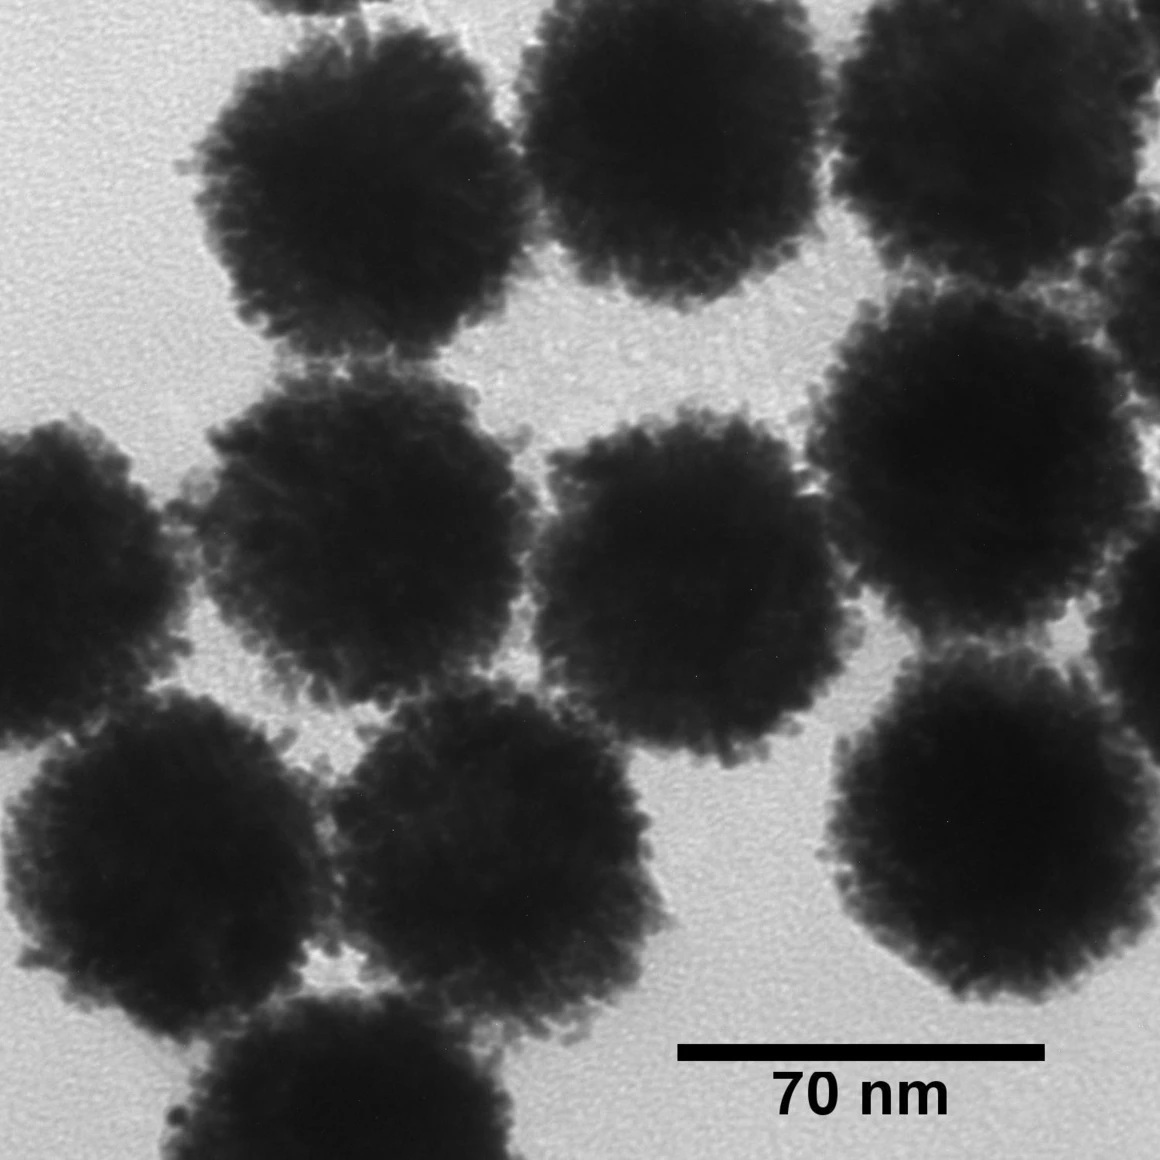 NANOXACT PLATINUM NANOPARTICLES-BARE (CITRATE)